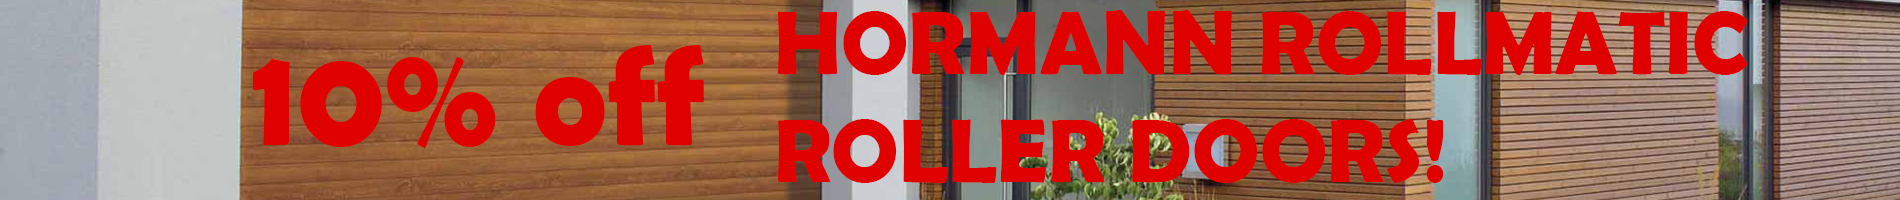 Hormann Rollmatic